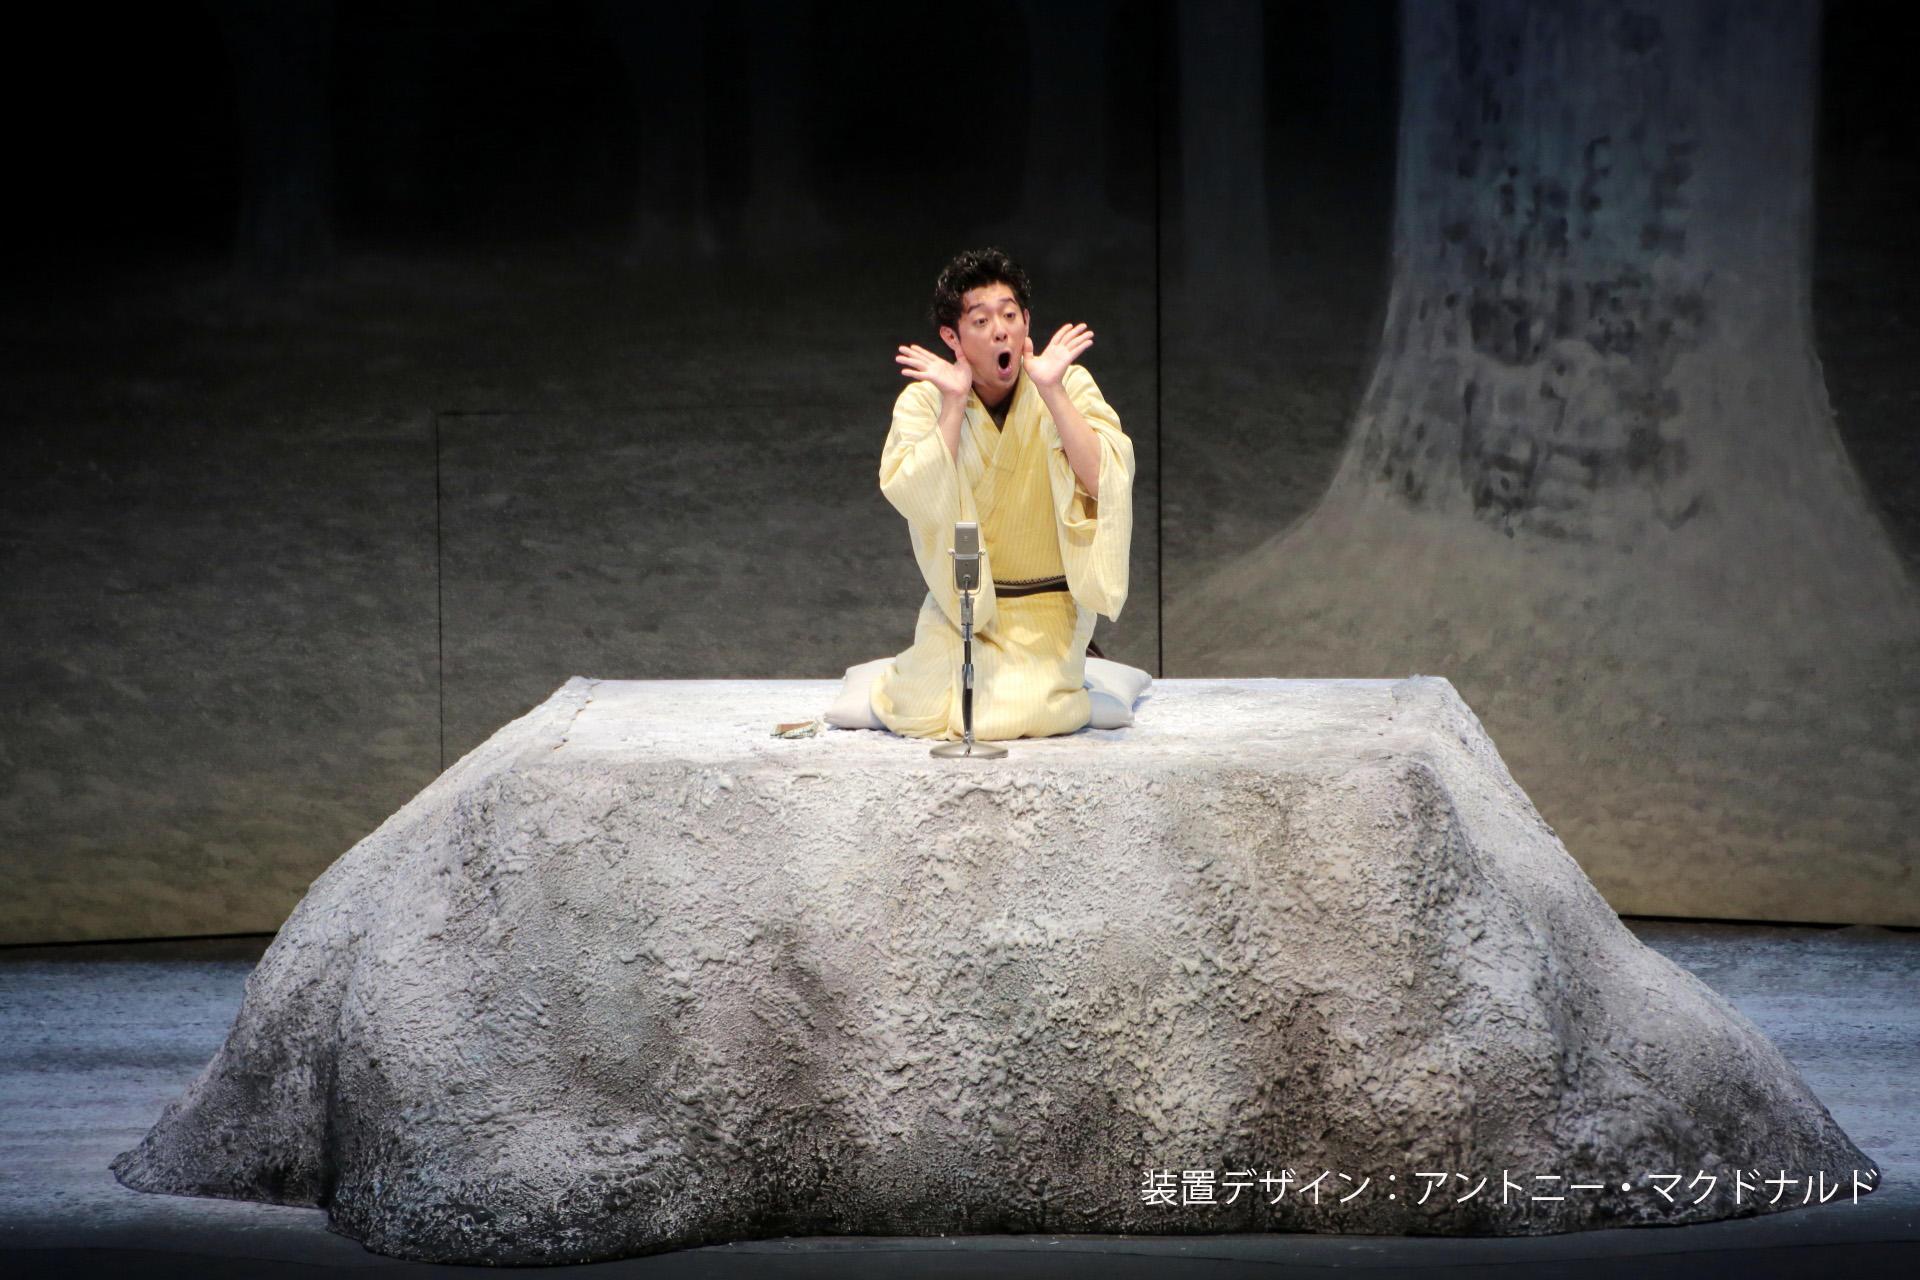 http://news.yoshimoto.co.jp/20160731004048-b88c059c89f22ebf196dbcfadd9fe8771d50fe6e.jpg